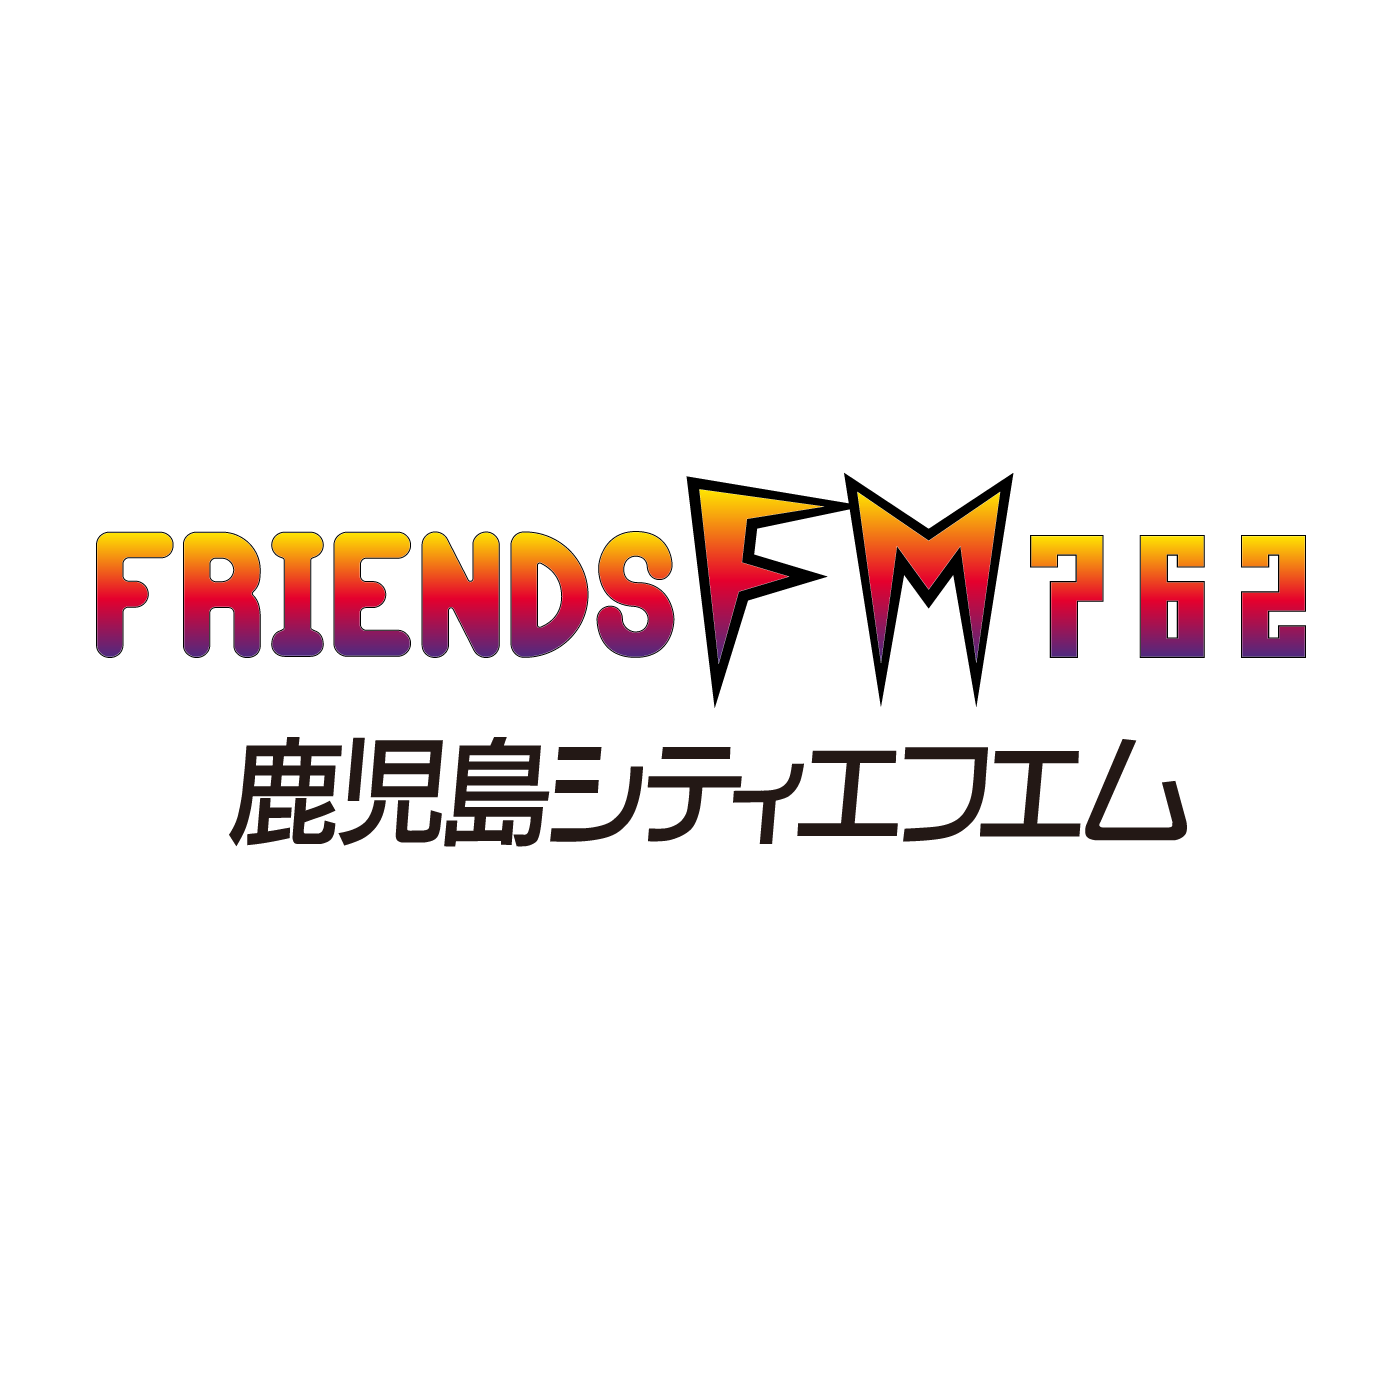 FRENDS FM 762 76.2MHz(鹿児島市)